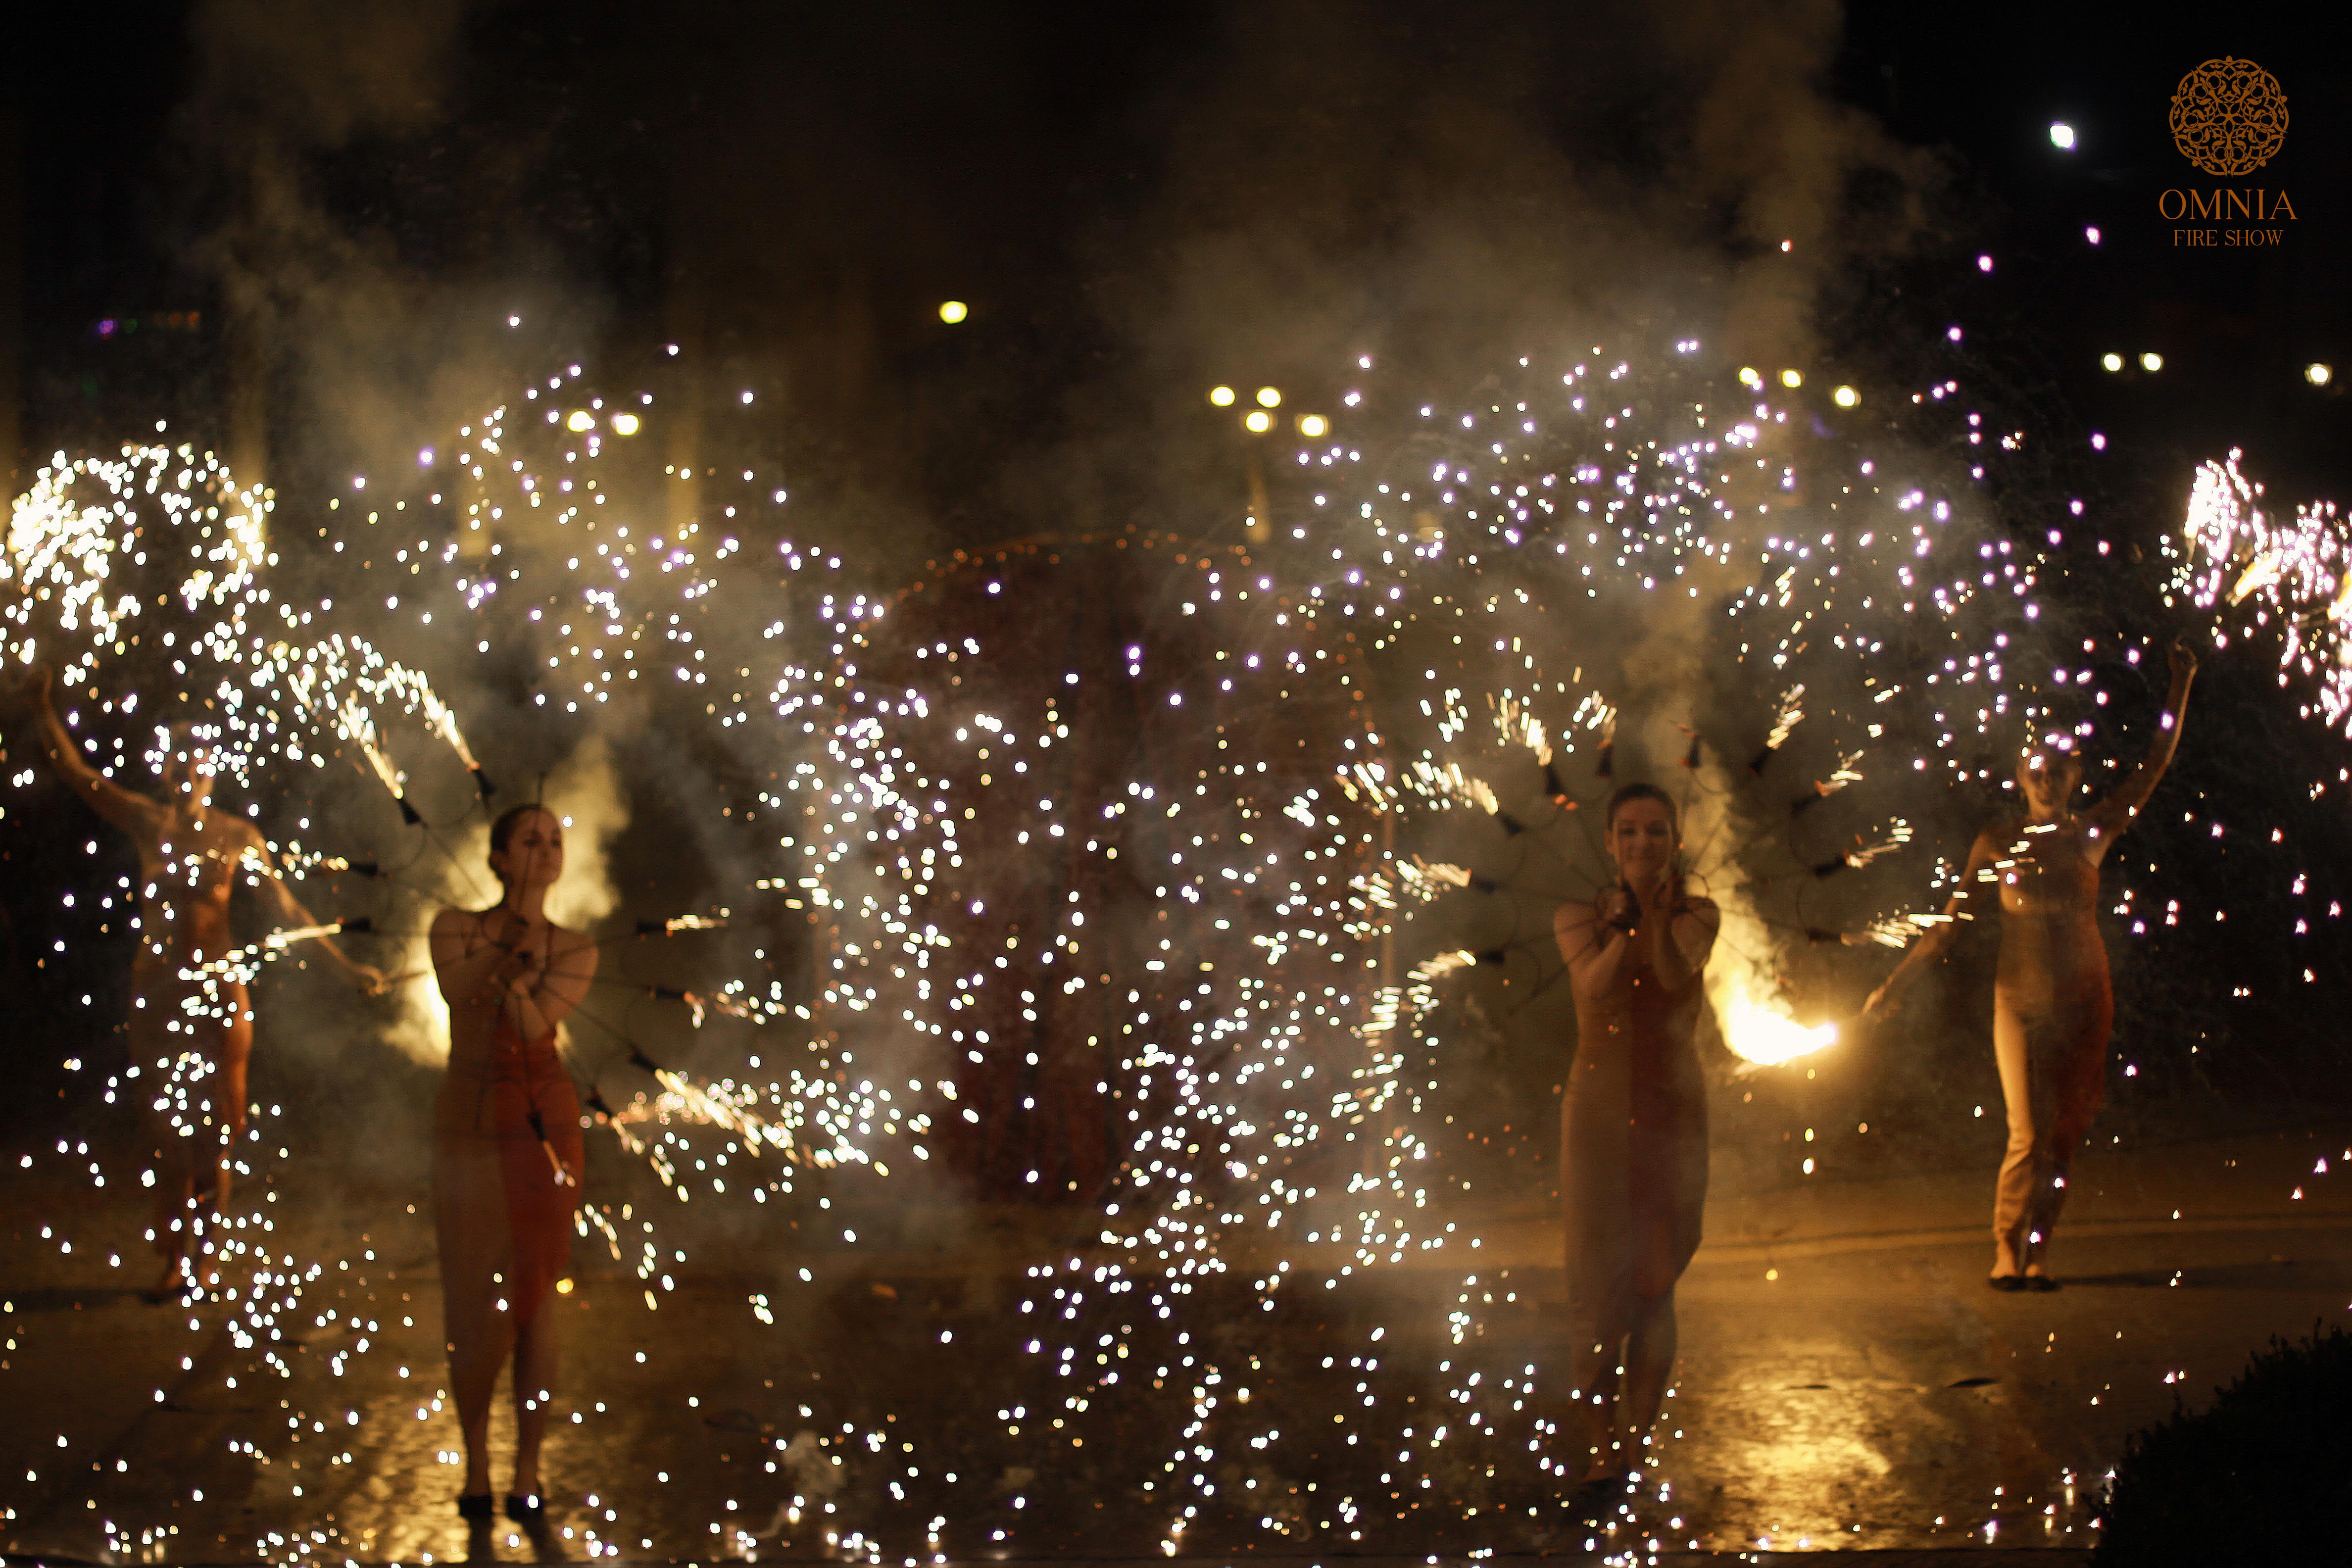 OMNIA fire show